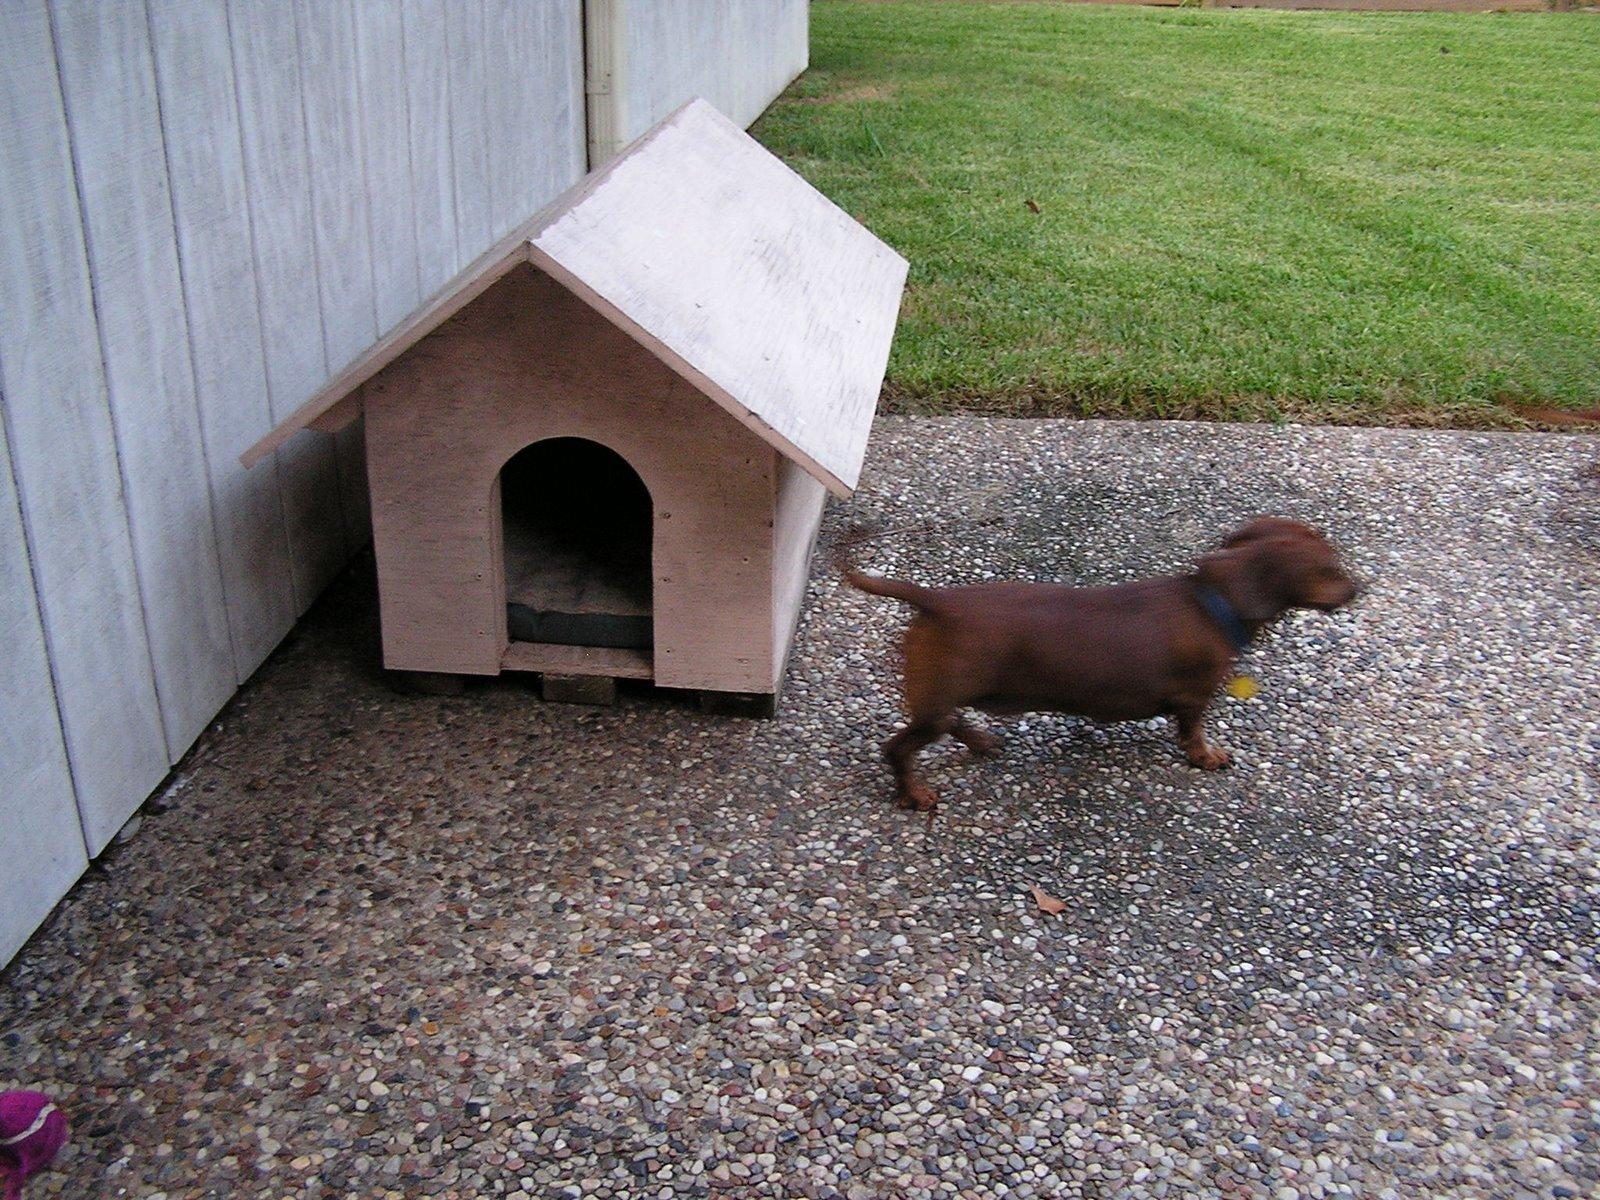 [Doghouse3.JPG]